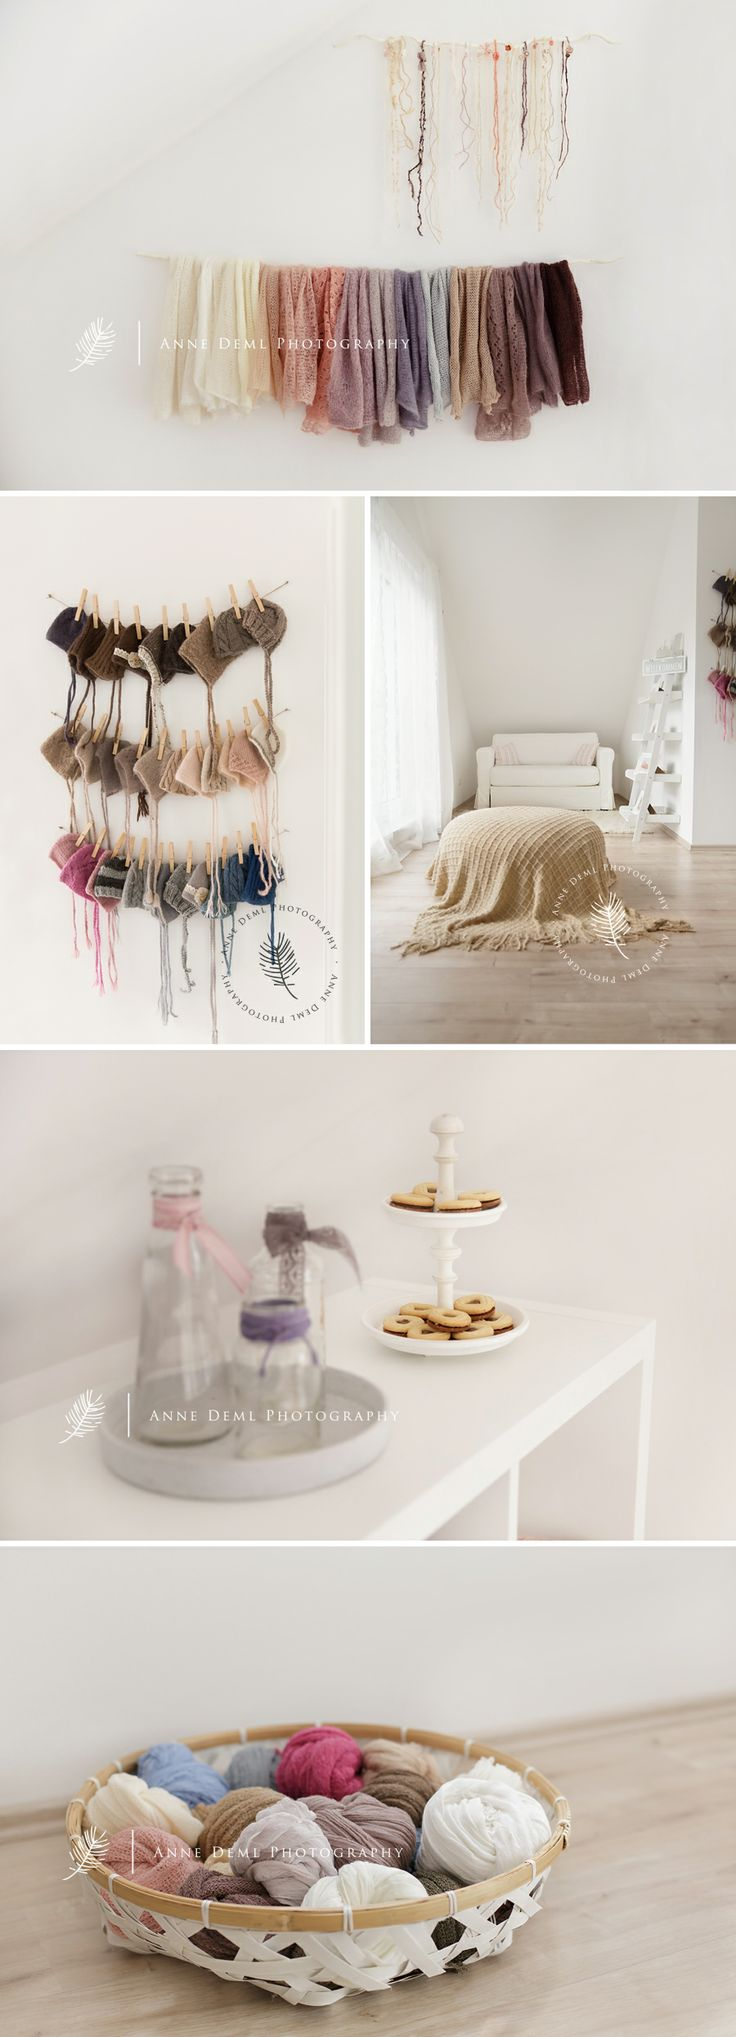 Bright And Nice Baby Studio For Newborn Photography Fotostudio